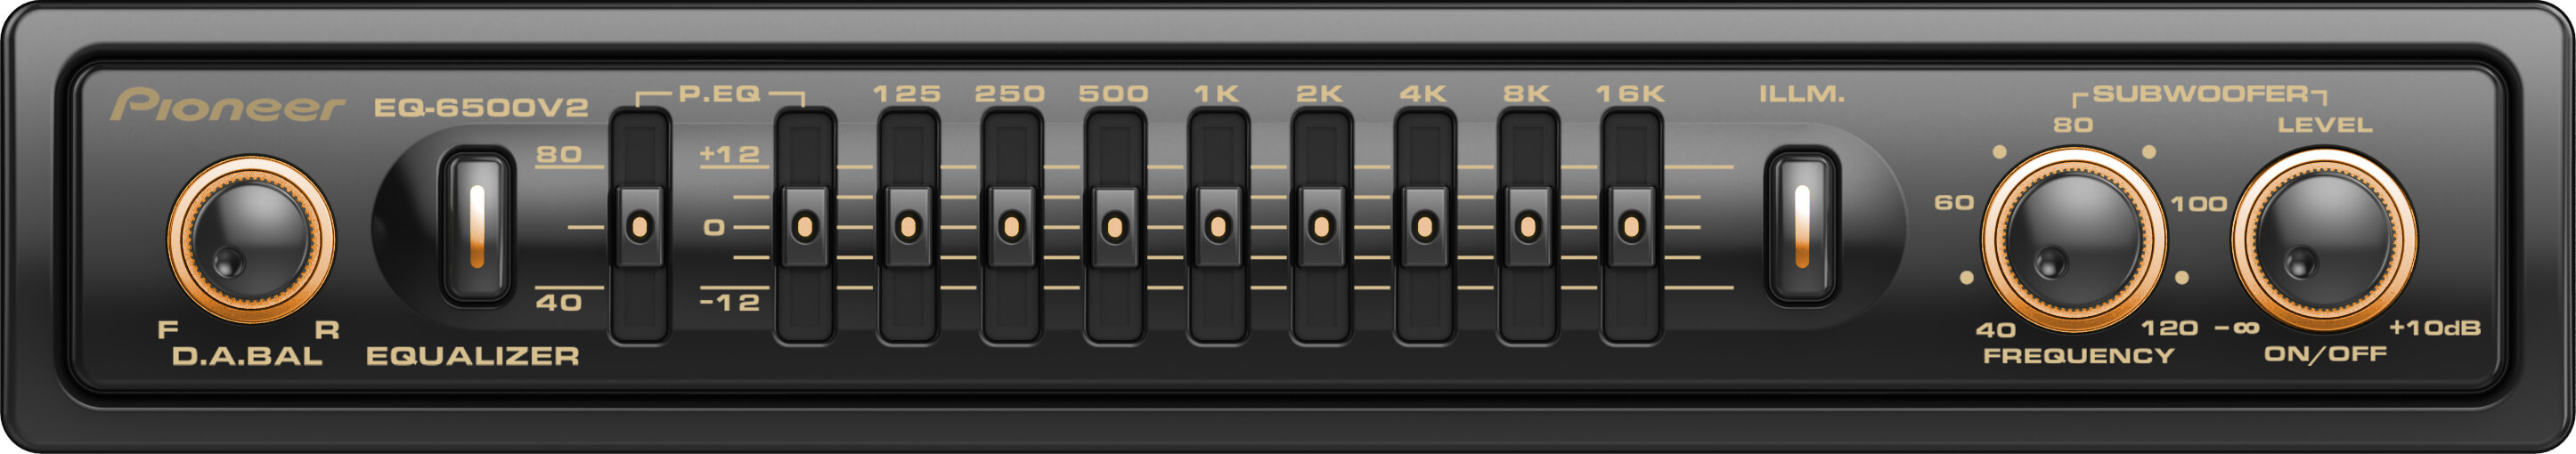 AF_4172] Wiring Pioneer Car Audio Equilizer Download DiagramUnnu Hete Over Iosco Jebrp Hisre Xeira Hyedi Mohammedshrine Librar Wiring  101